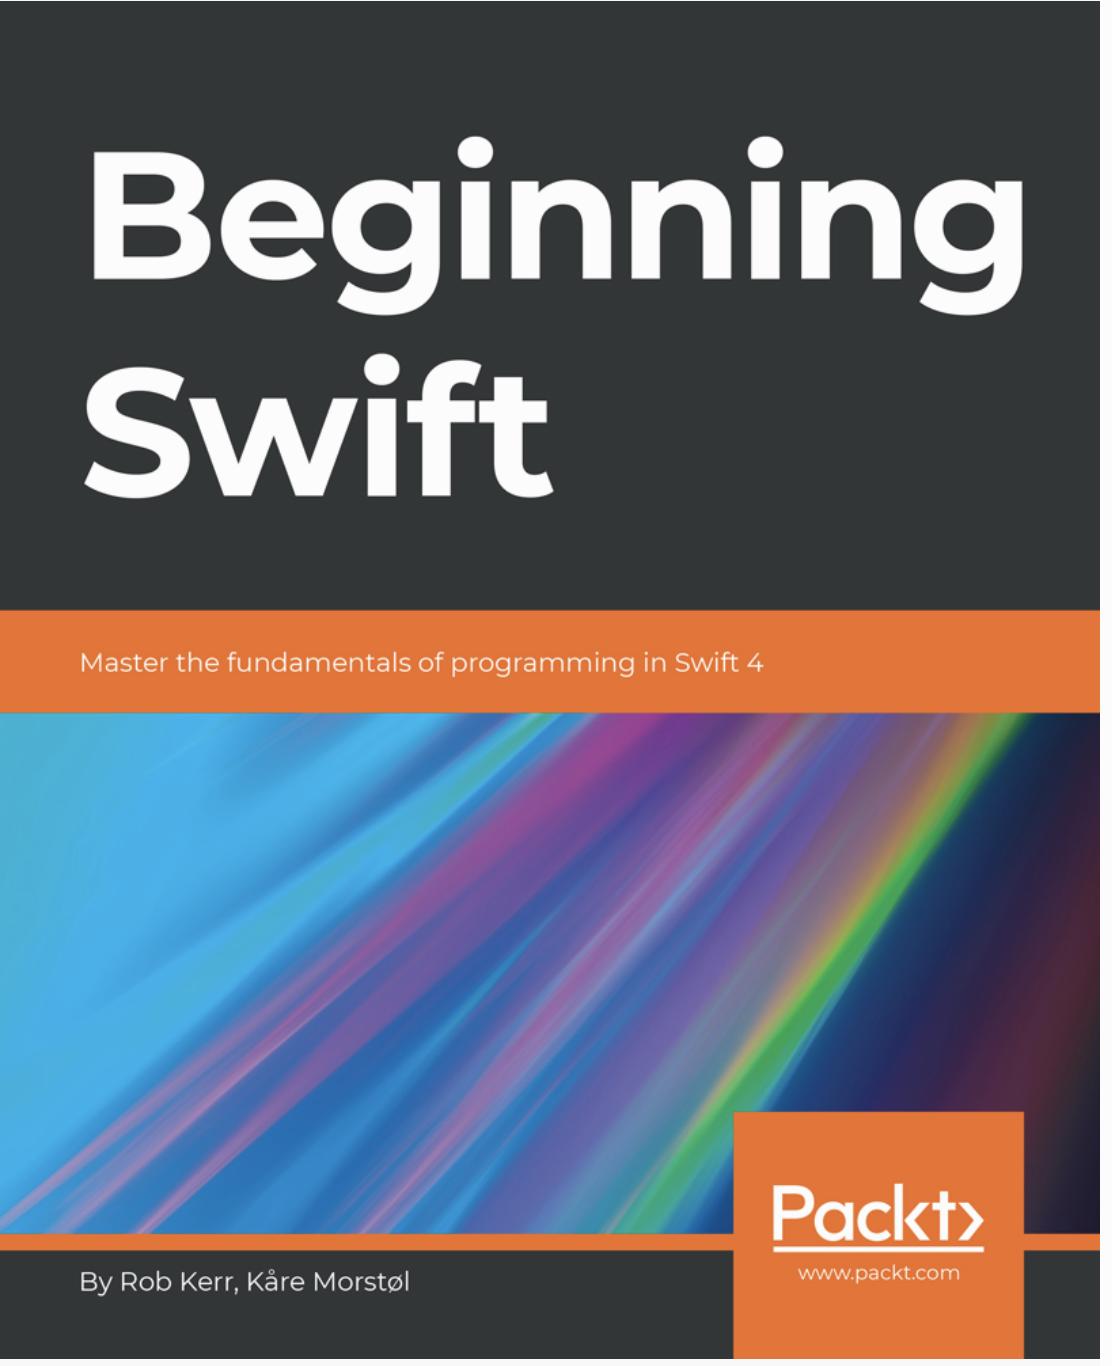 Functional programming in swift florian kugler ebook array programming ebook rh prograbooks com fandeluxe Image collections